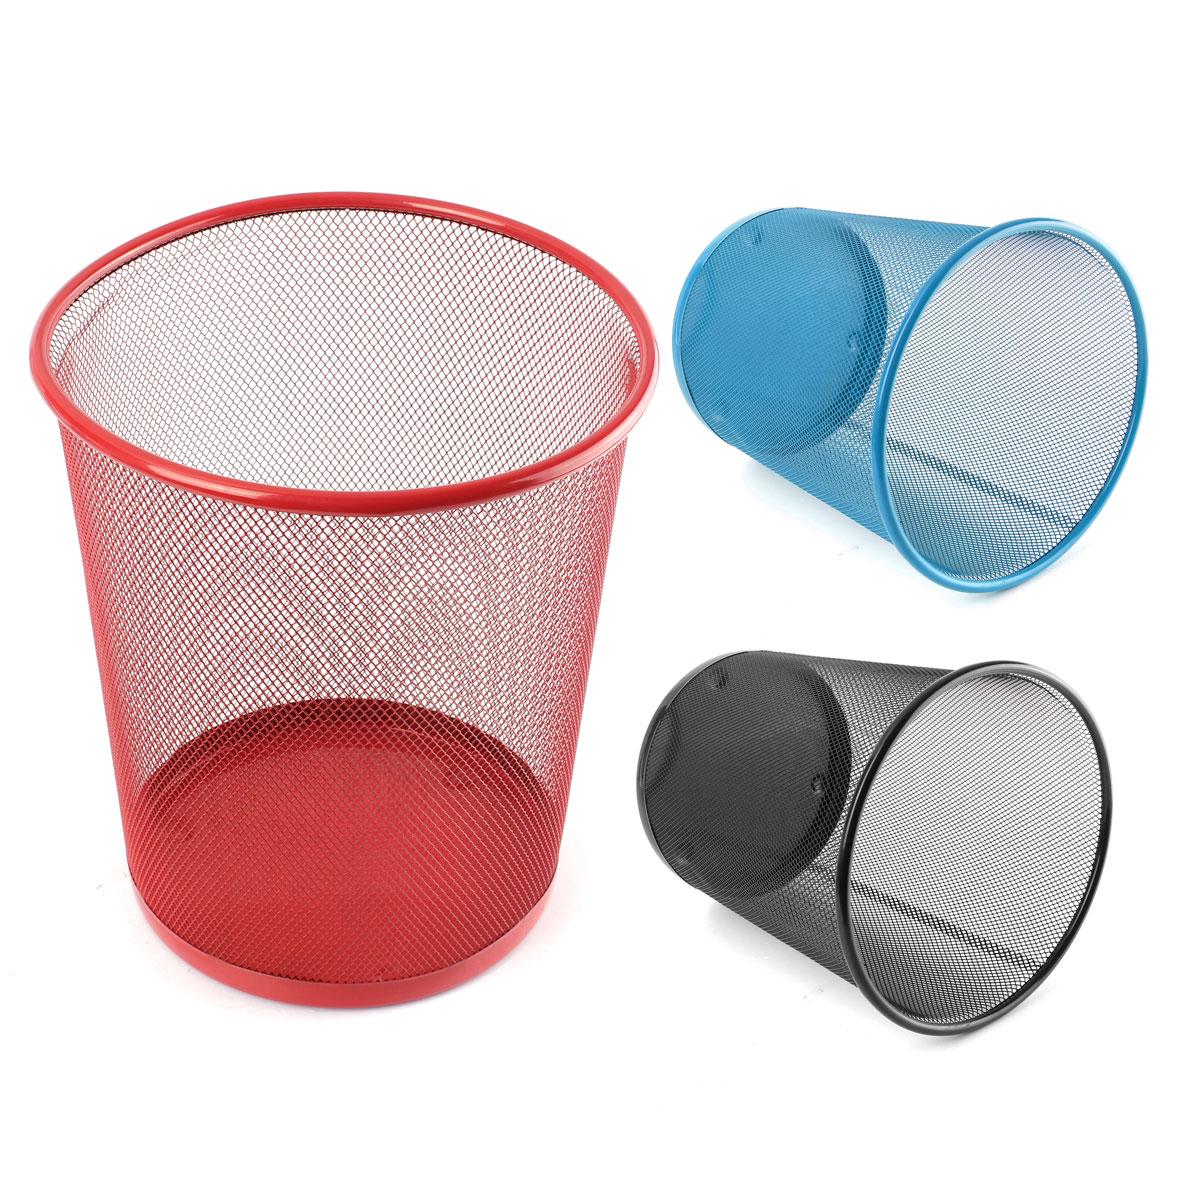 1x Sponge Cone Metal Polishing Foam Pad Wool Buffing: Metal Mesh Waste Bin Can Wastebasket Office Home Garbage